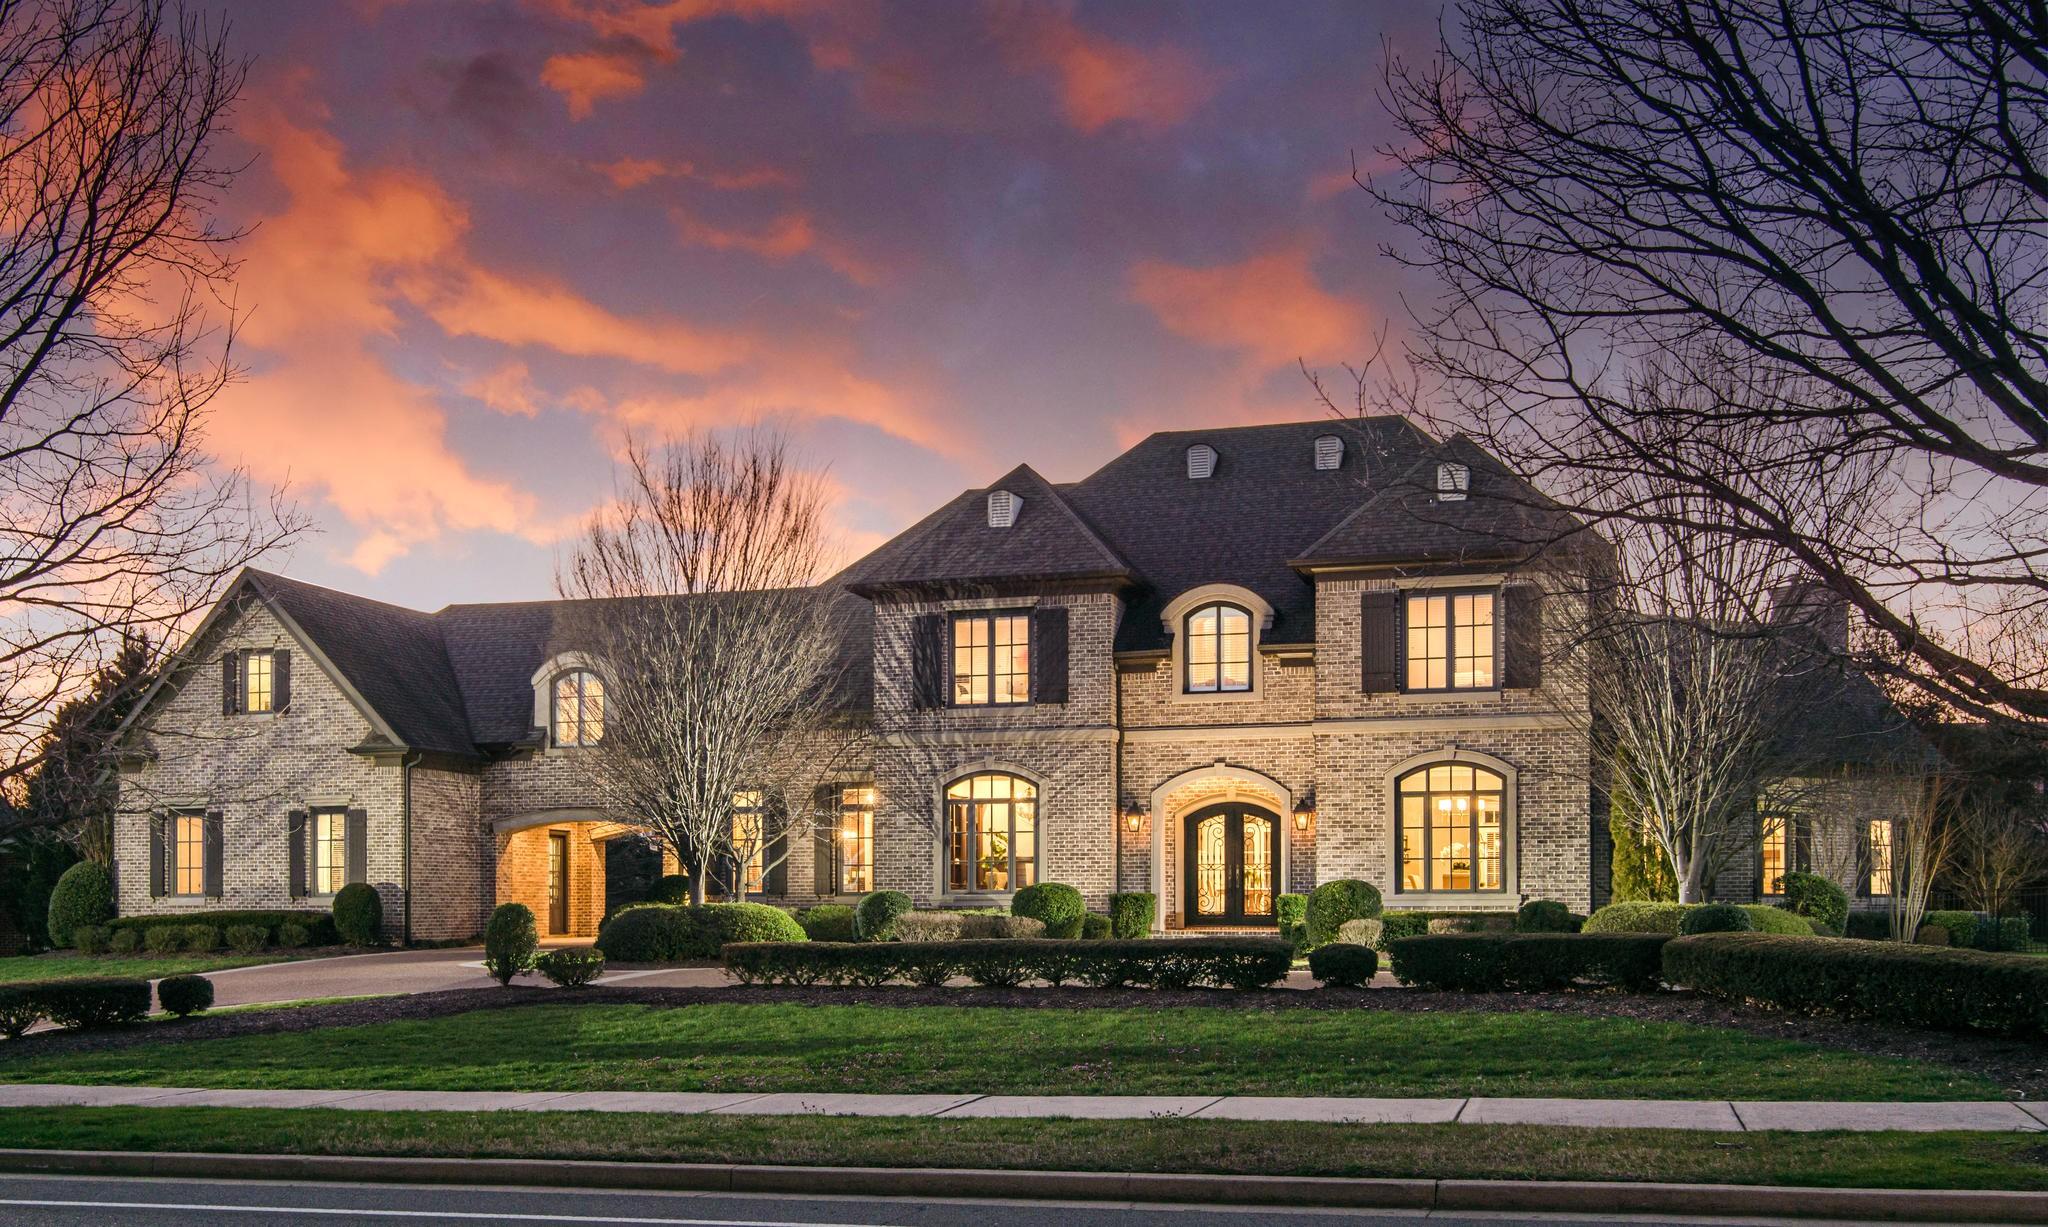 395 Jones Pkwy, Brentwood, TN 37027 - Brentwood, TN real estate listing